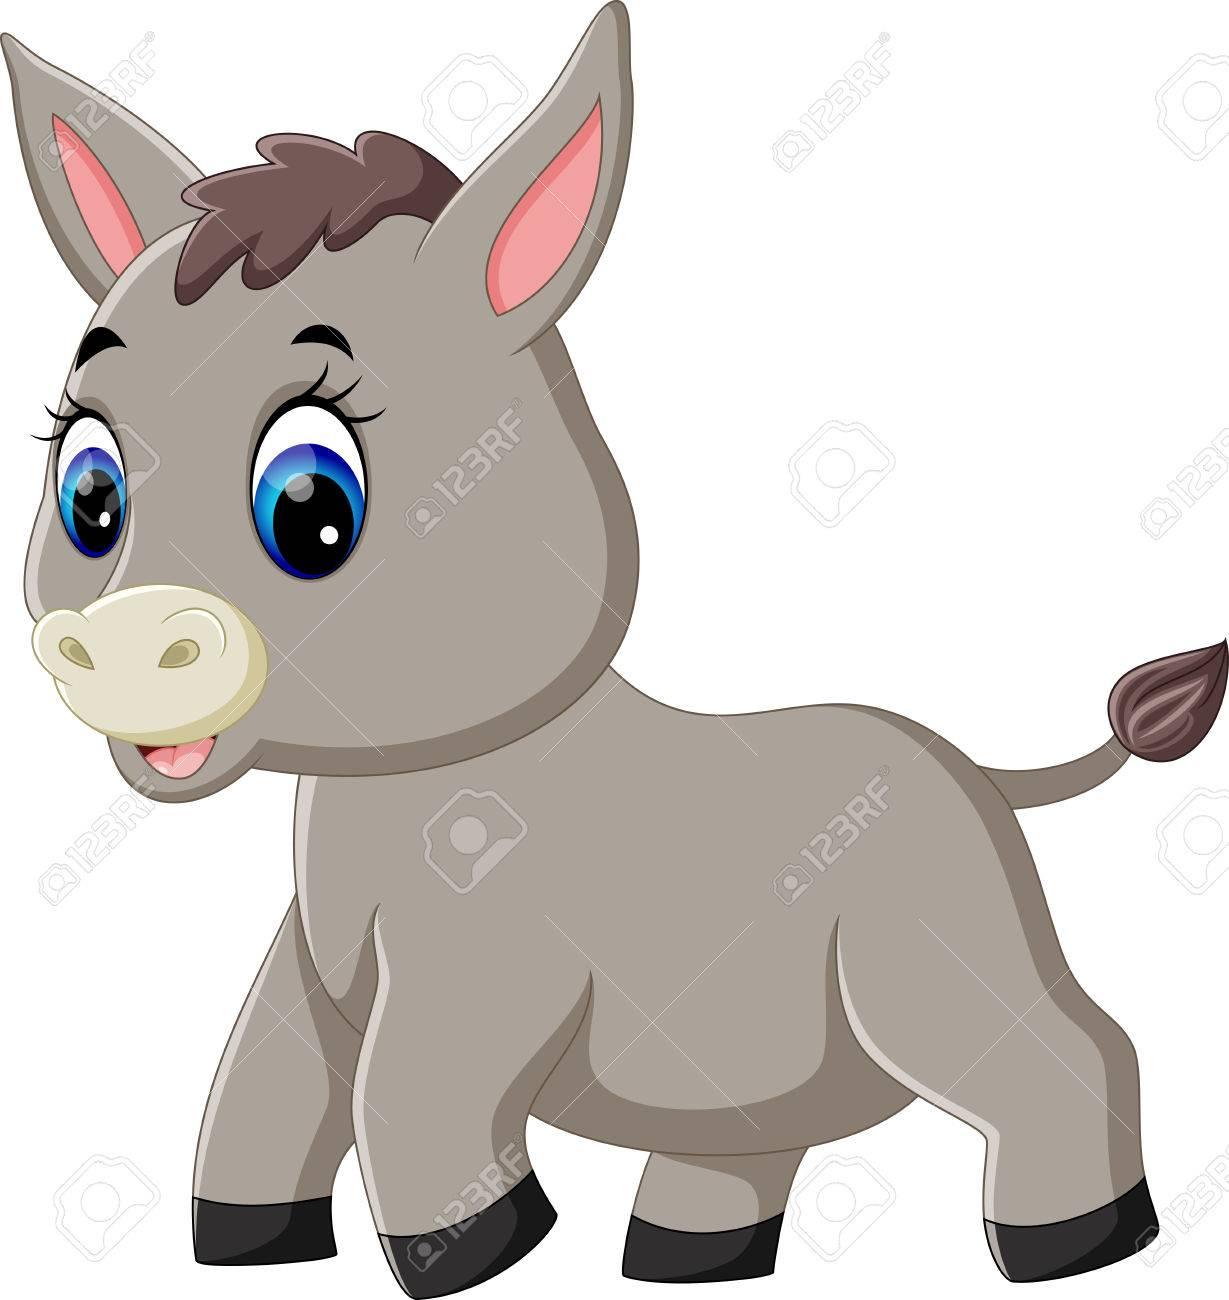 1229x1300 Illustration Of Cute Baby Donkey Cartoon Royalty Free Cliparts